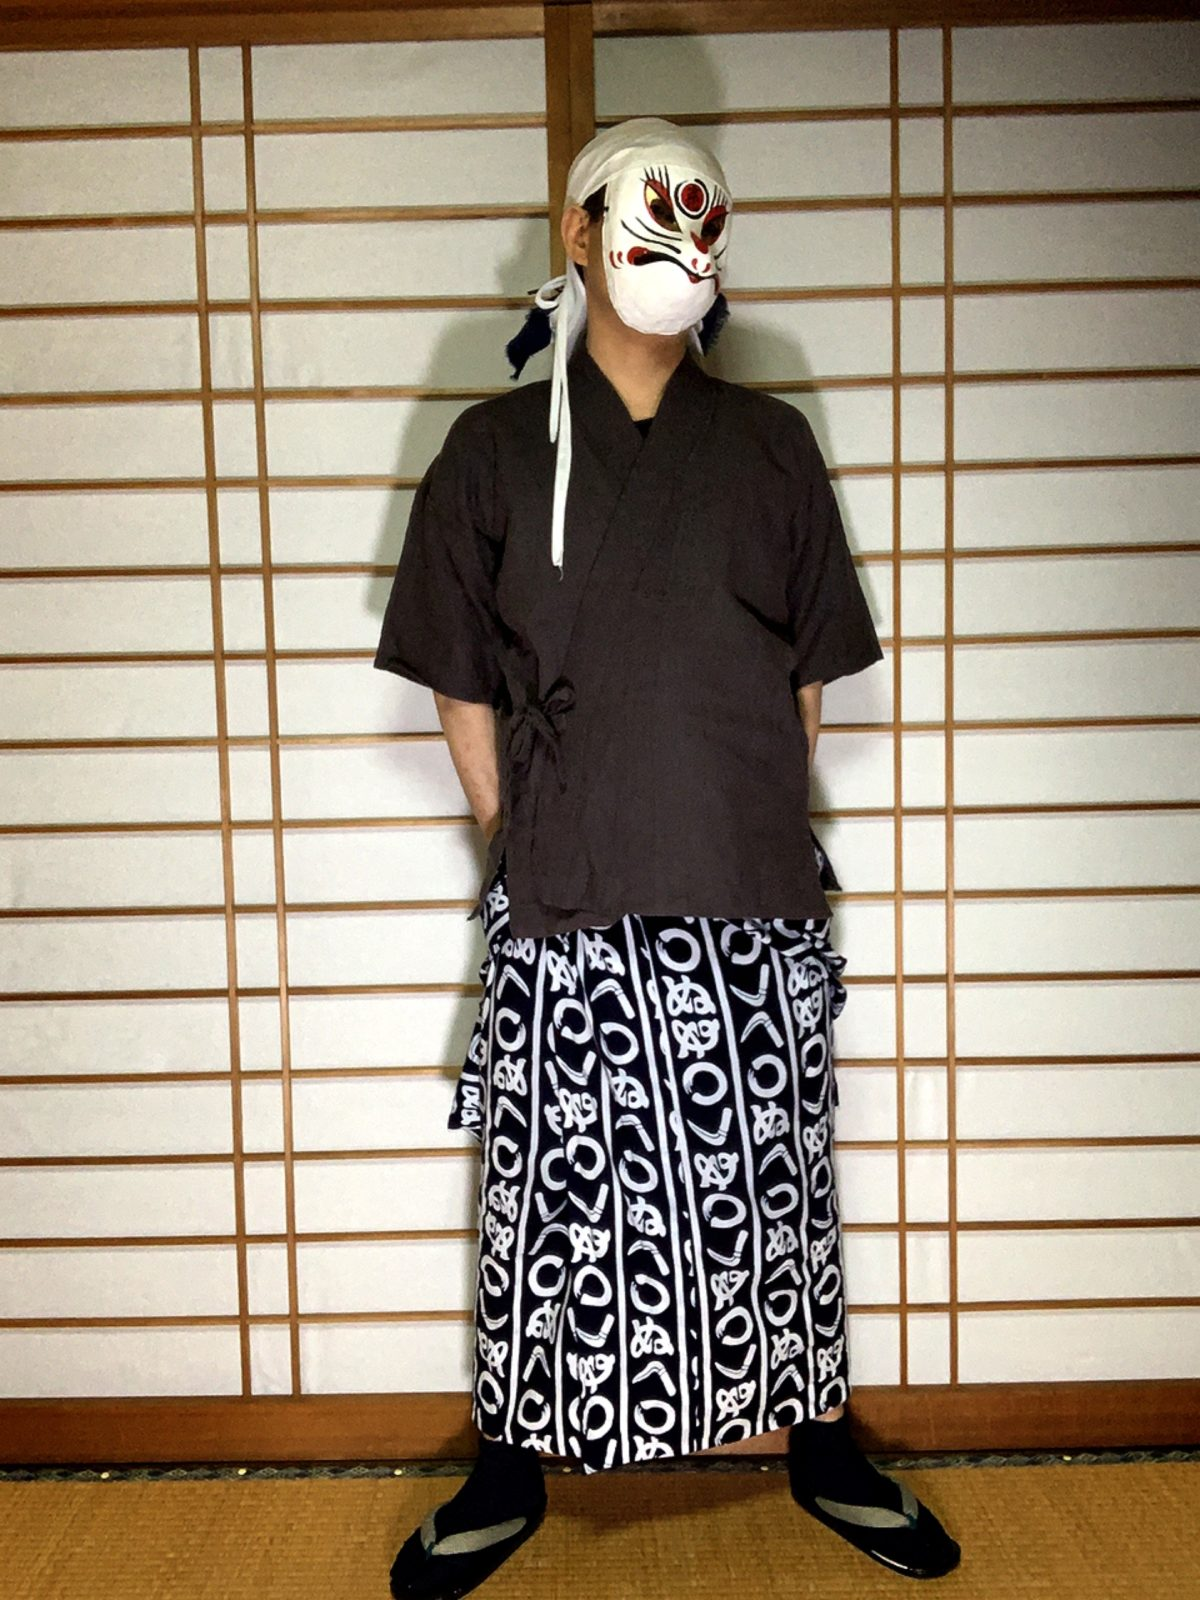 男の和服,メンズ着物,狐面,日本,裏着物,浴衣,和,文化,肌襦袢,